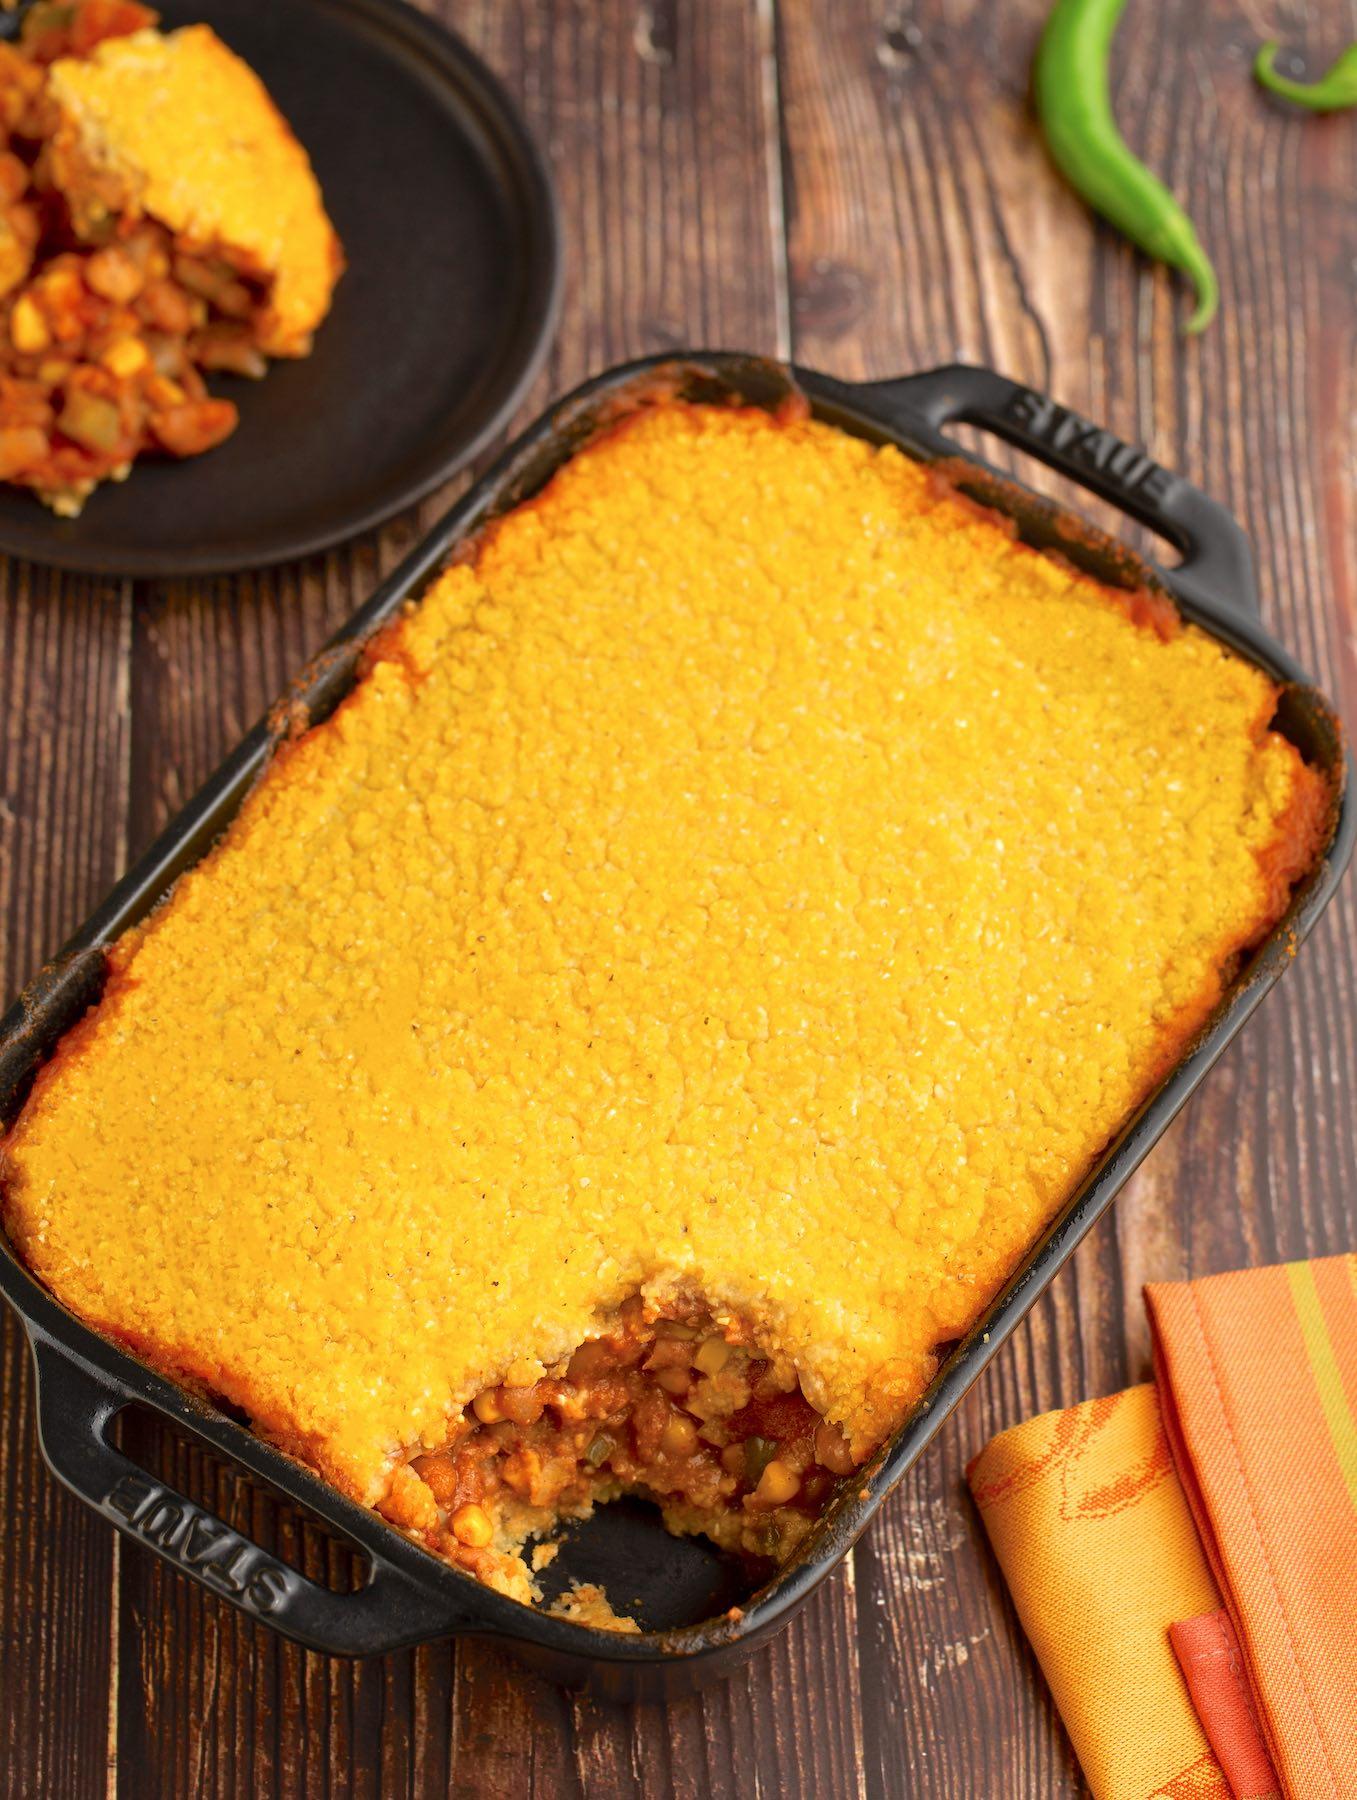 Vegan Cornmeal crusted chili bean casserole